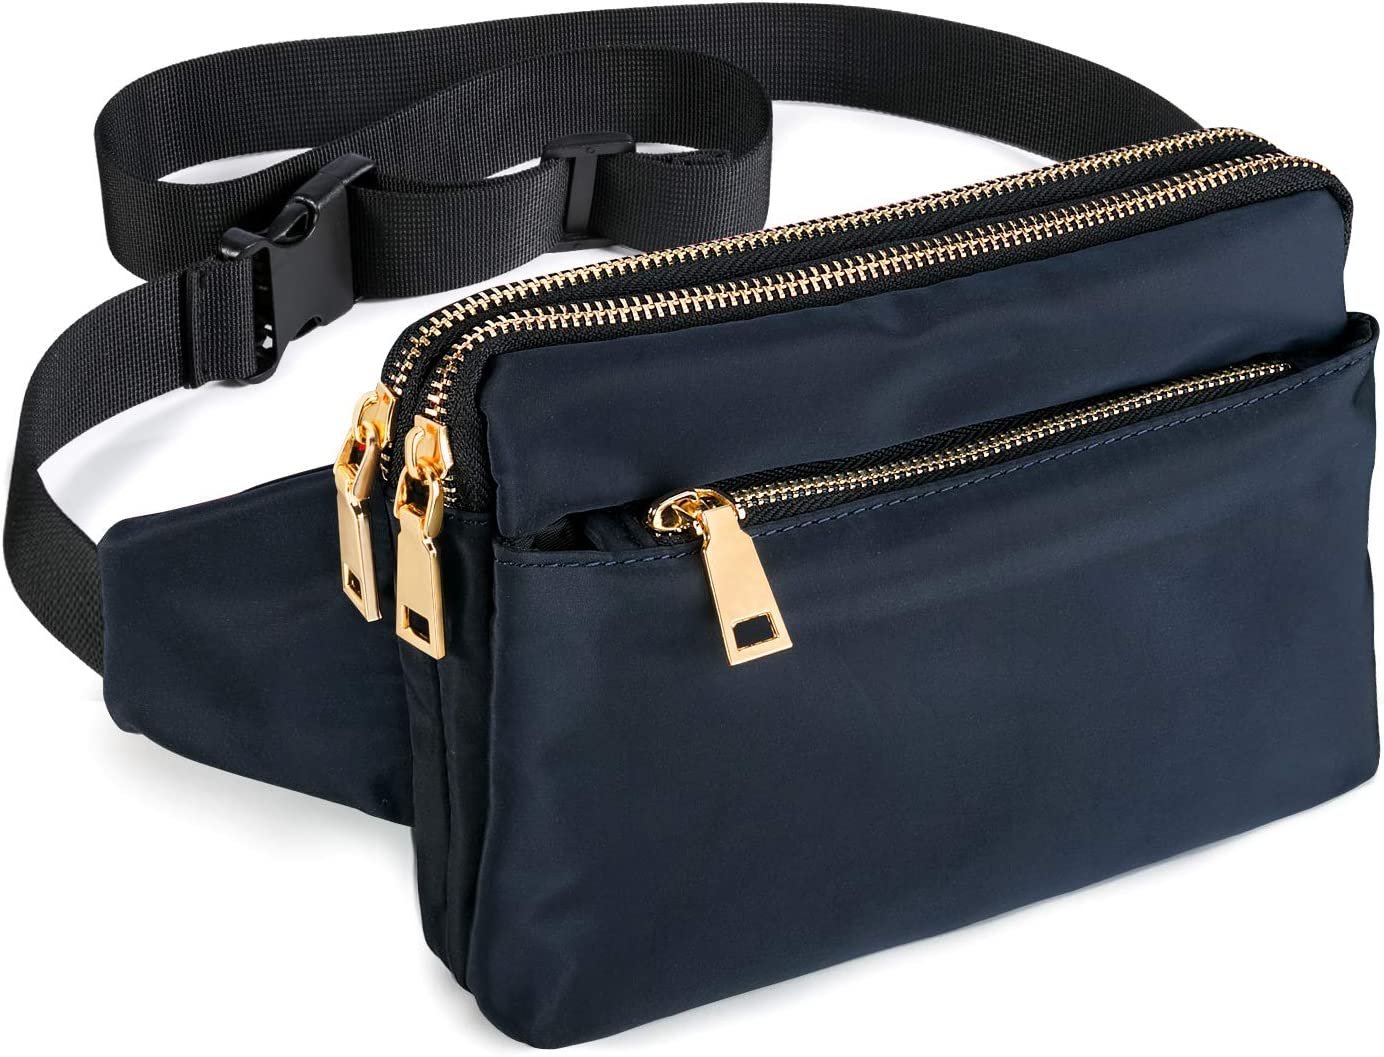 belt bag waist pack hip pack waist bag bum bag traveler bag funny bag waist purse festival bag hip bag